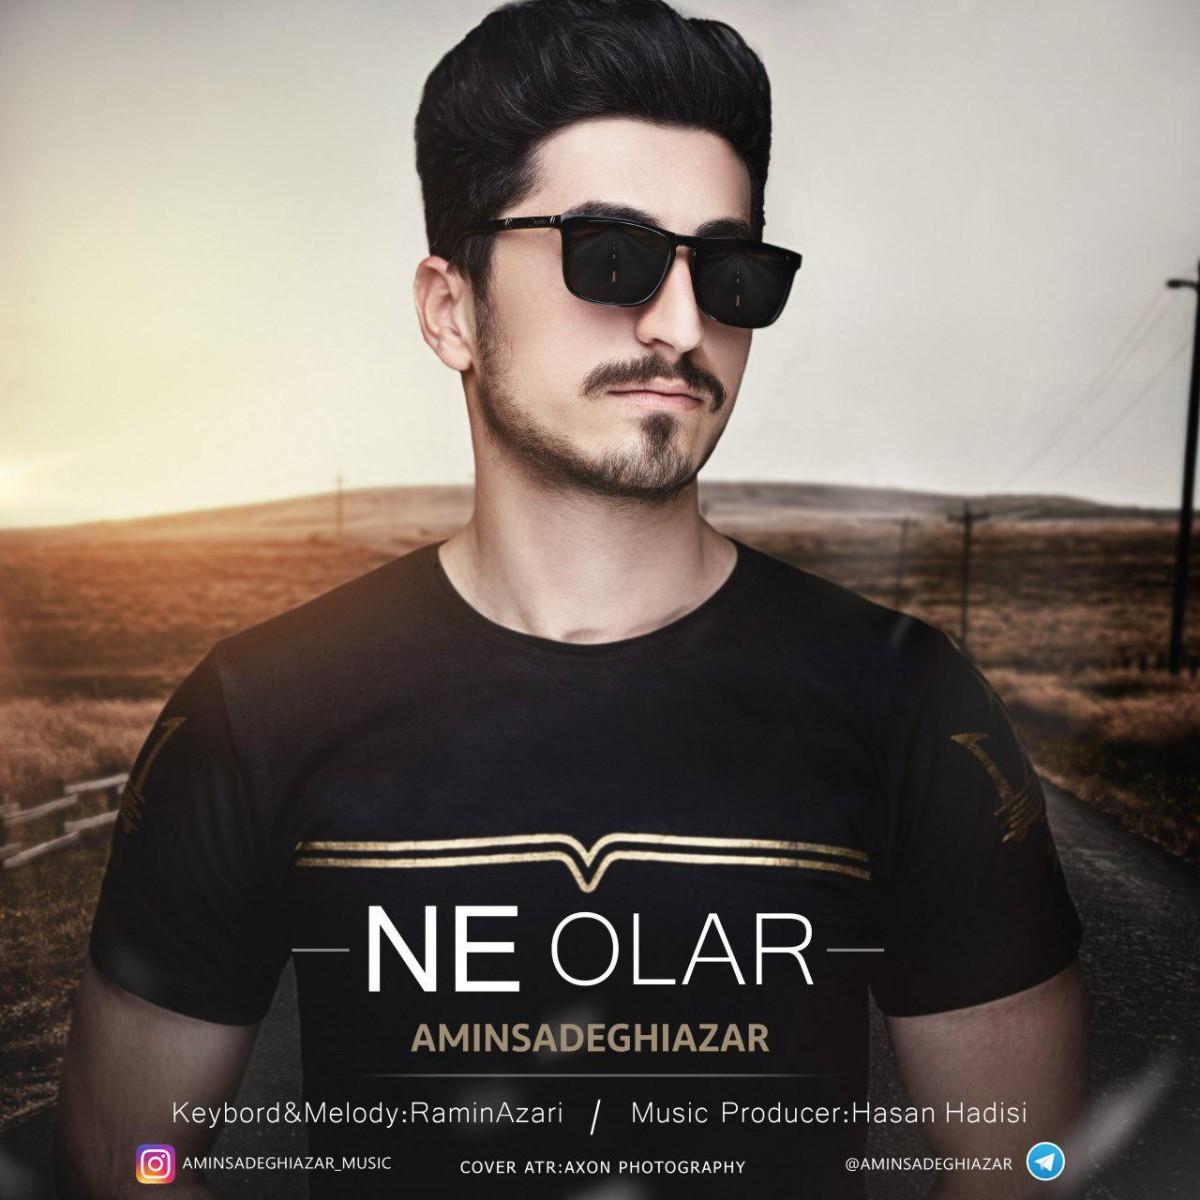 http://s8.picofile.com/file/8330185018/05Amin_Sadeghi_Azar_Na_Olar.jpg